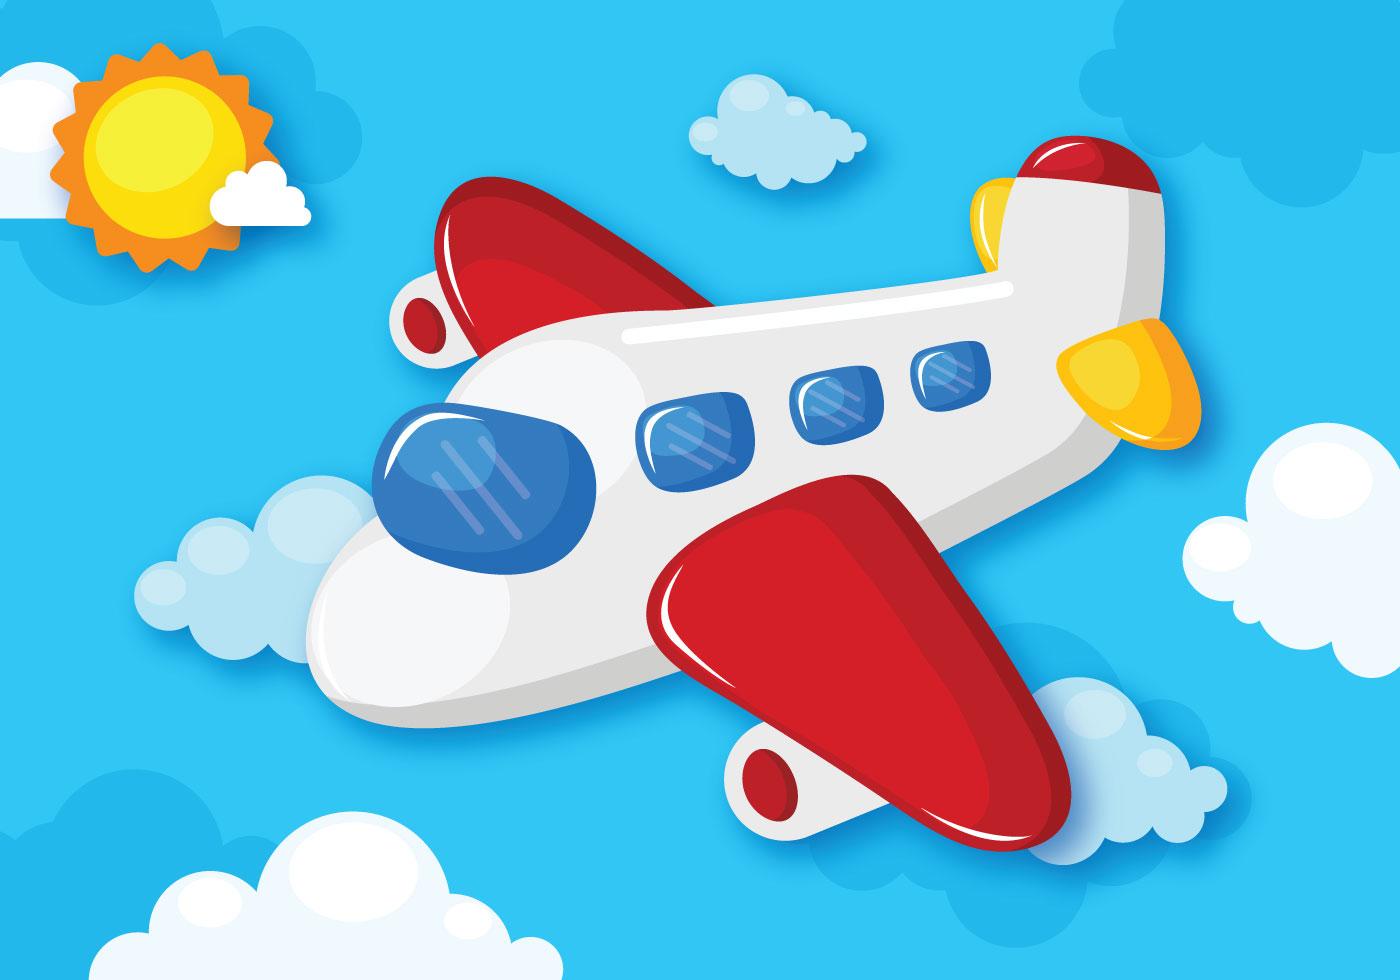 Картинка веселого самолетика